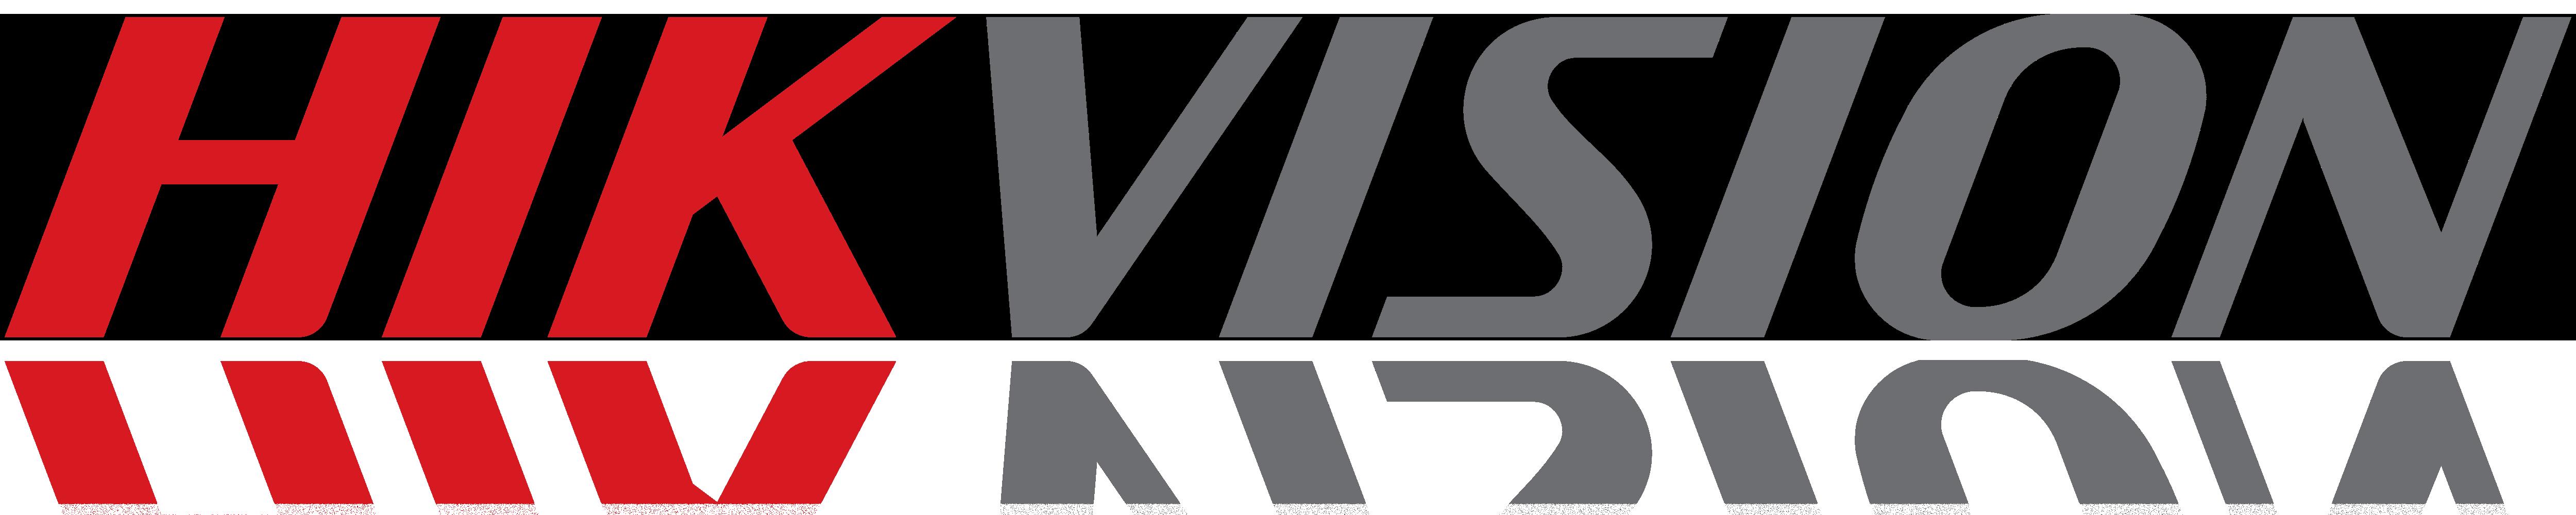 Hikvision_logo_shadow